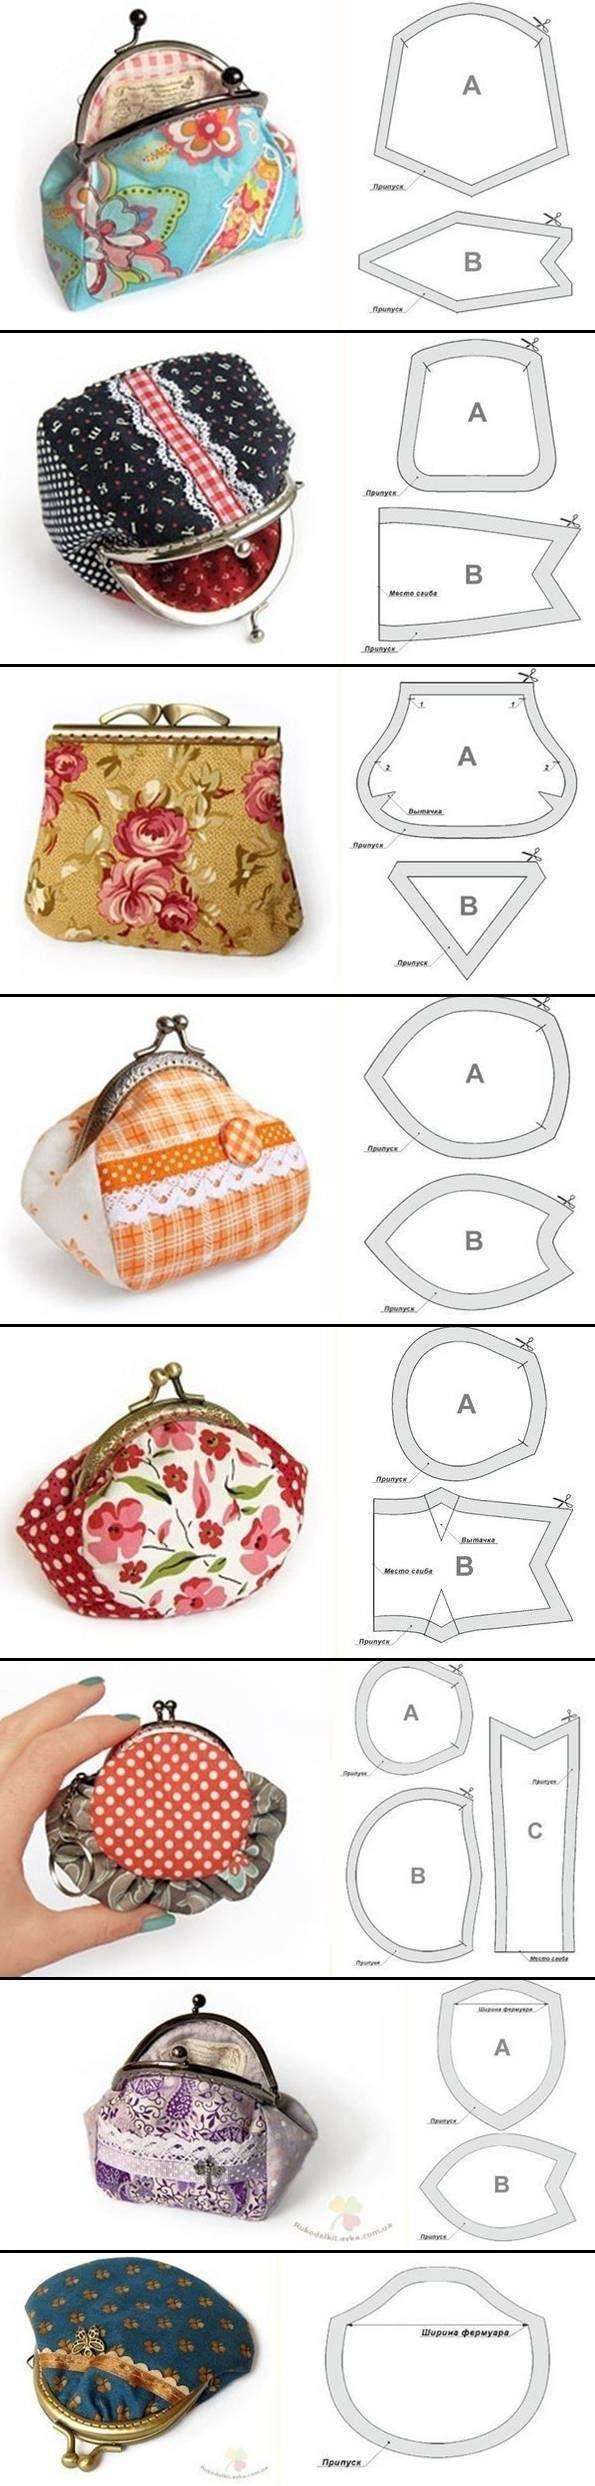 DIY Cute Purse Templates: